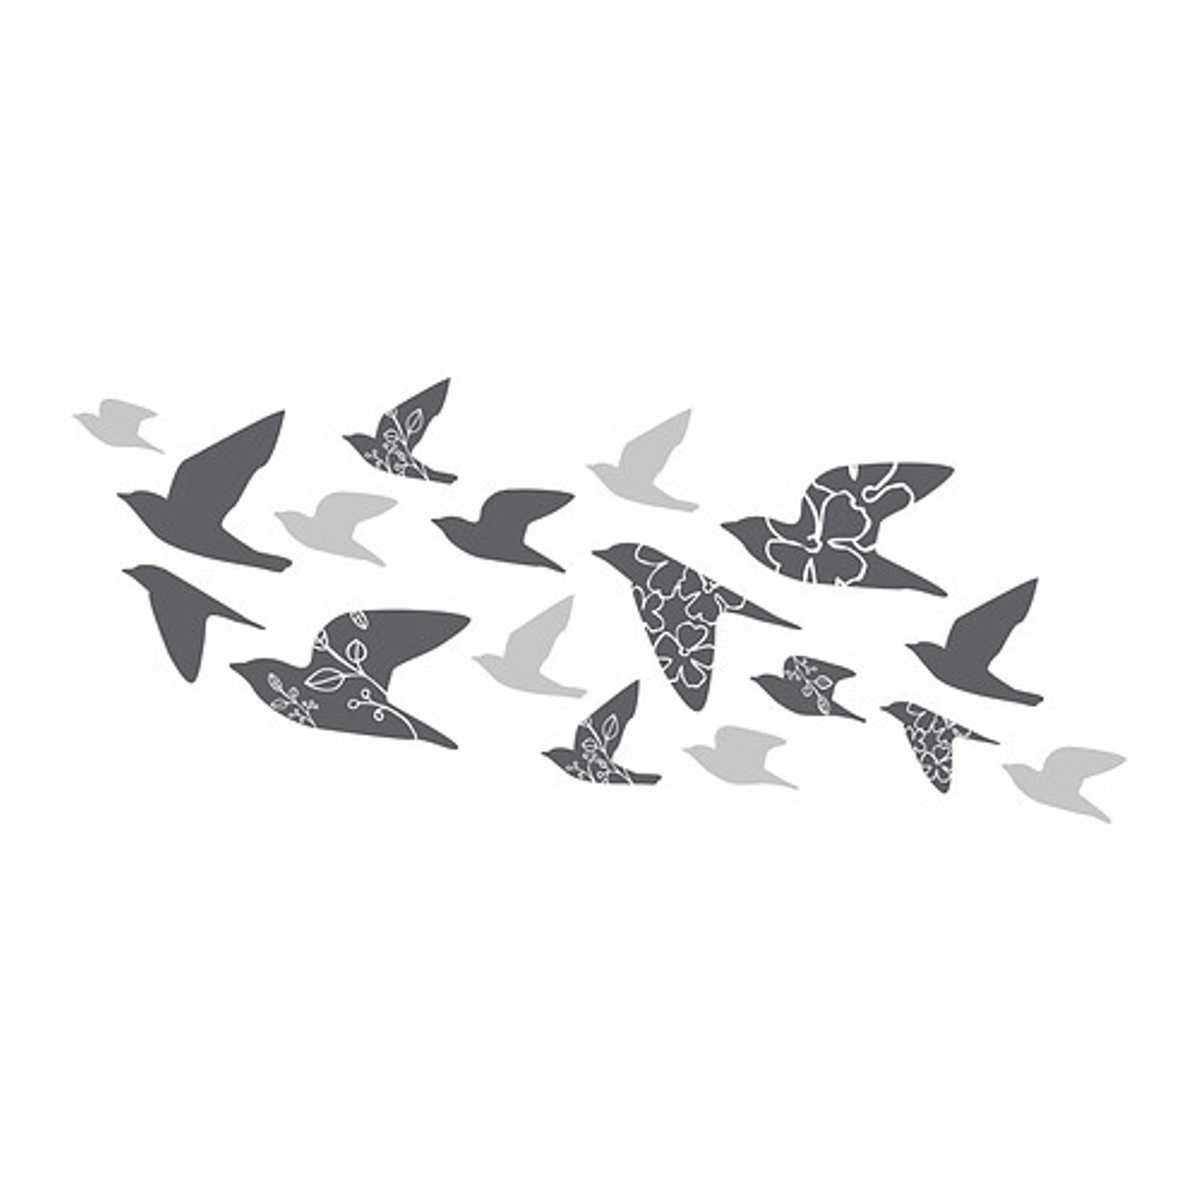 vinilos decorativos de Ikea - mod. Slätthult, pájaros al vuelo